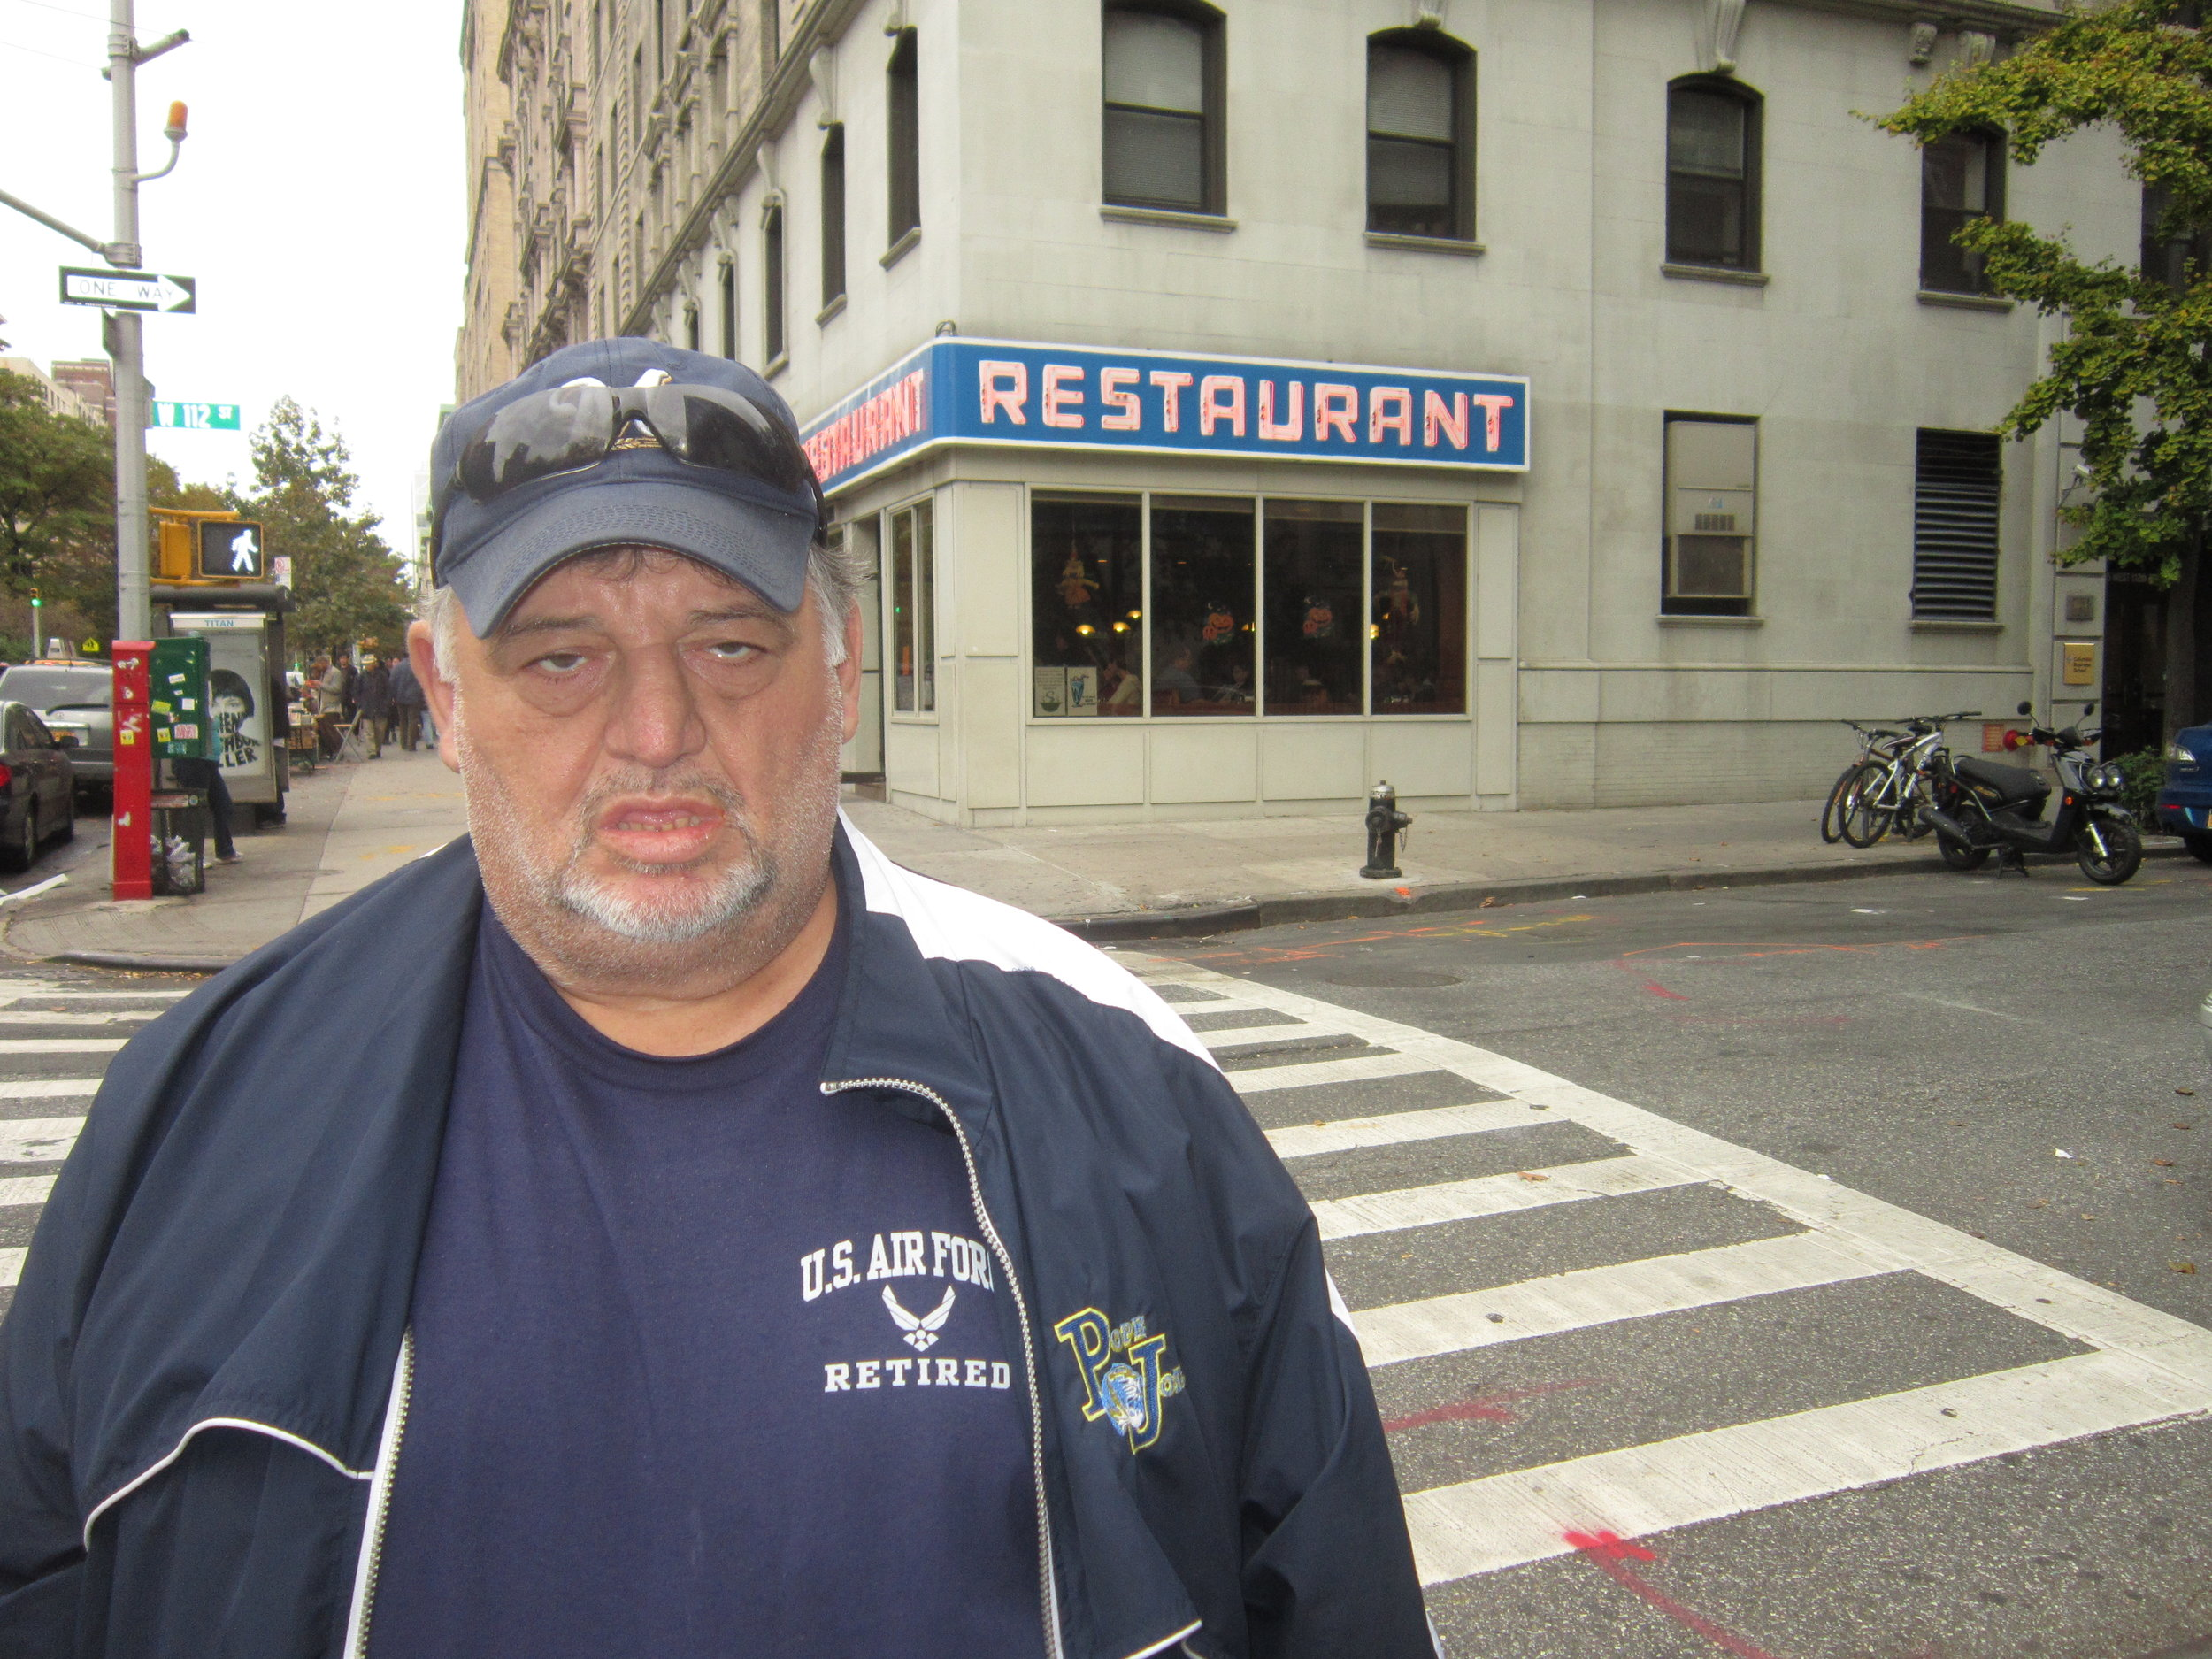 Bull at the Seinfeld Diner